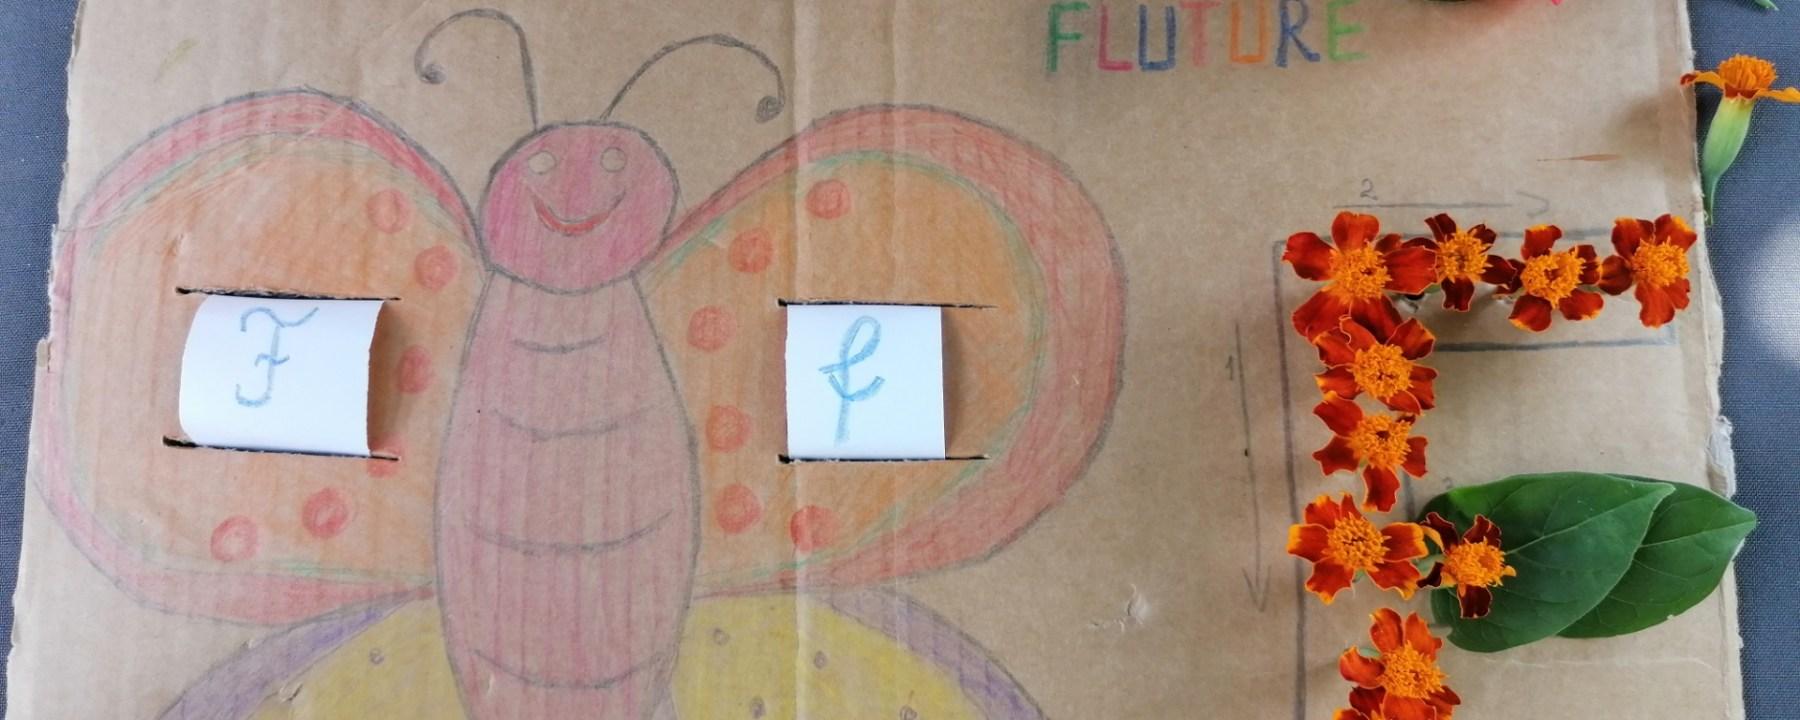 Litera F de la FLUTURE si FLOARE